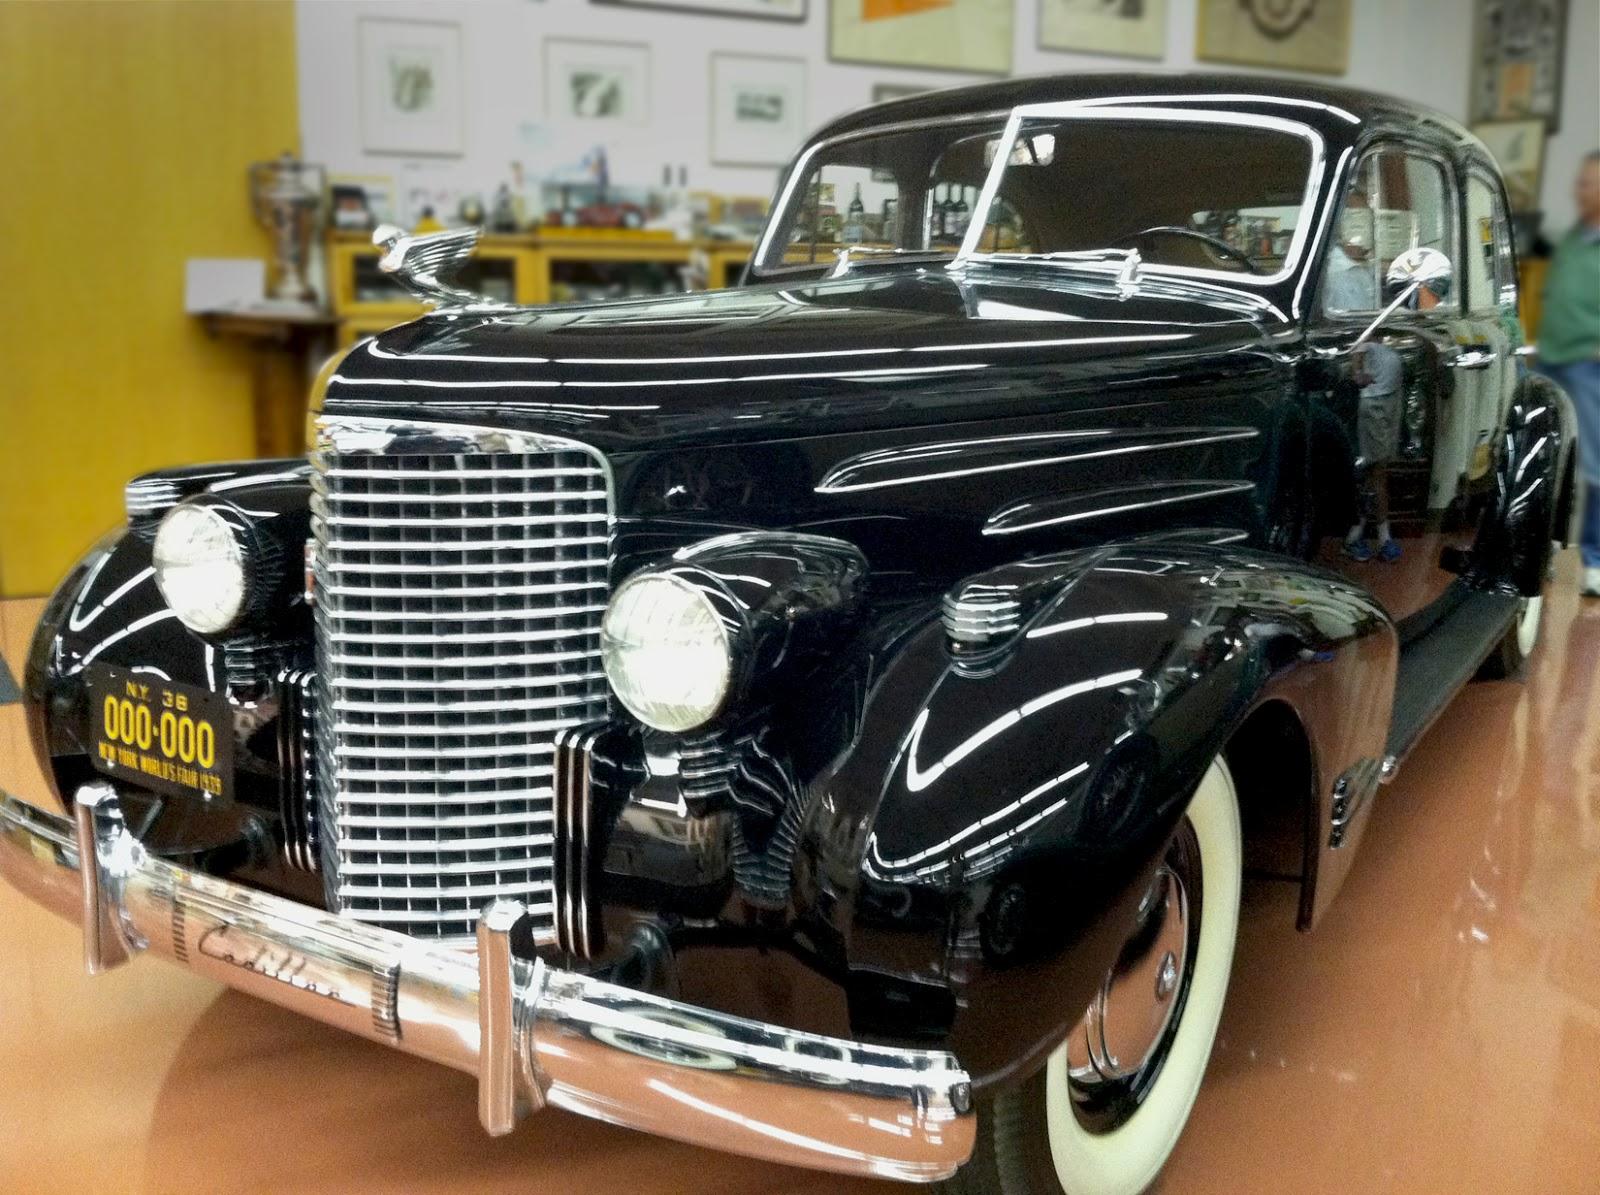 1938 cadillac v16 engine